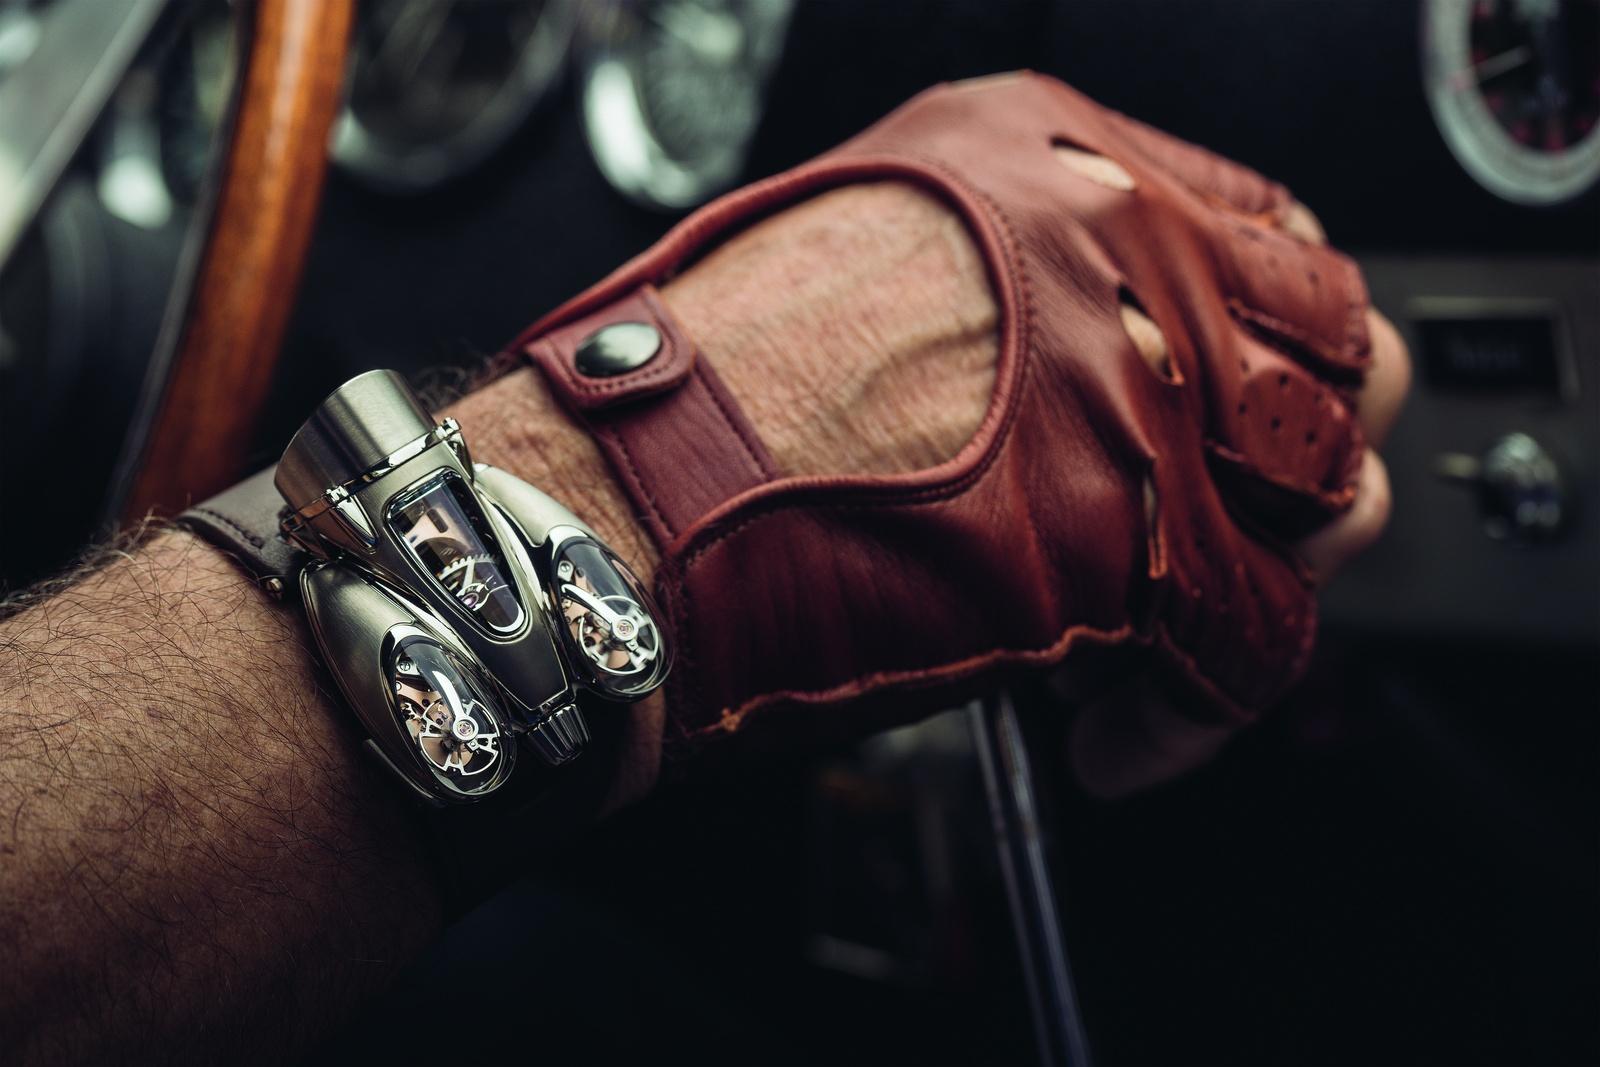 MB&F Horological Machine N°9 'Flow' HM9 wrist gear